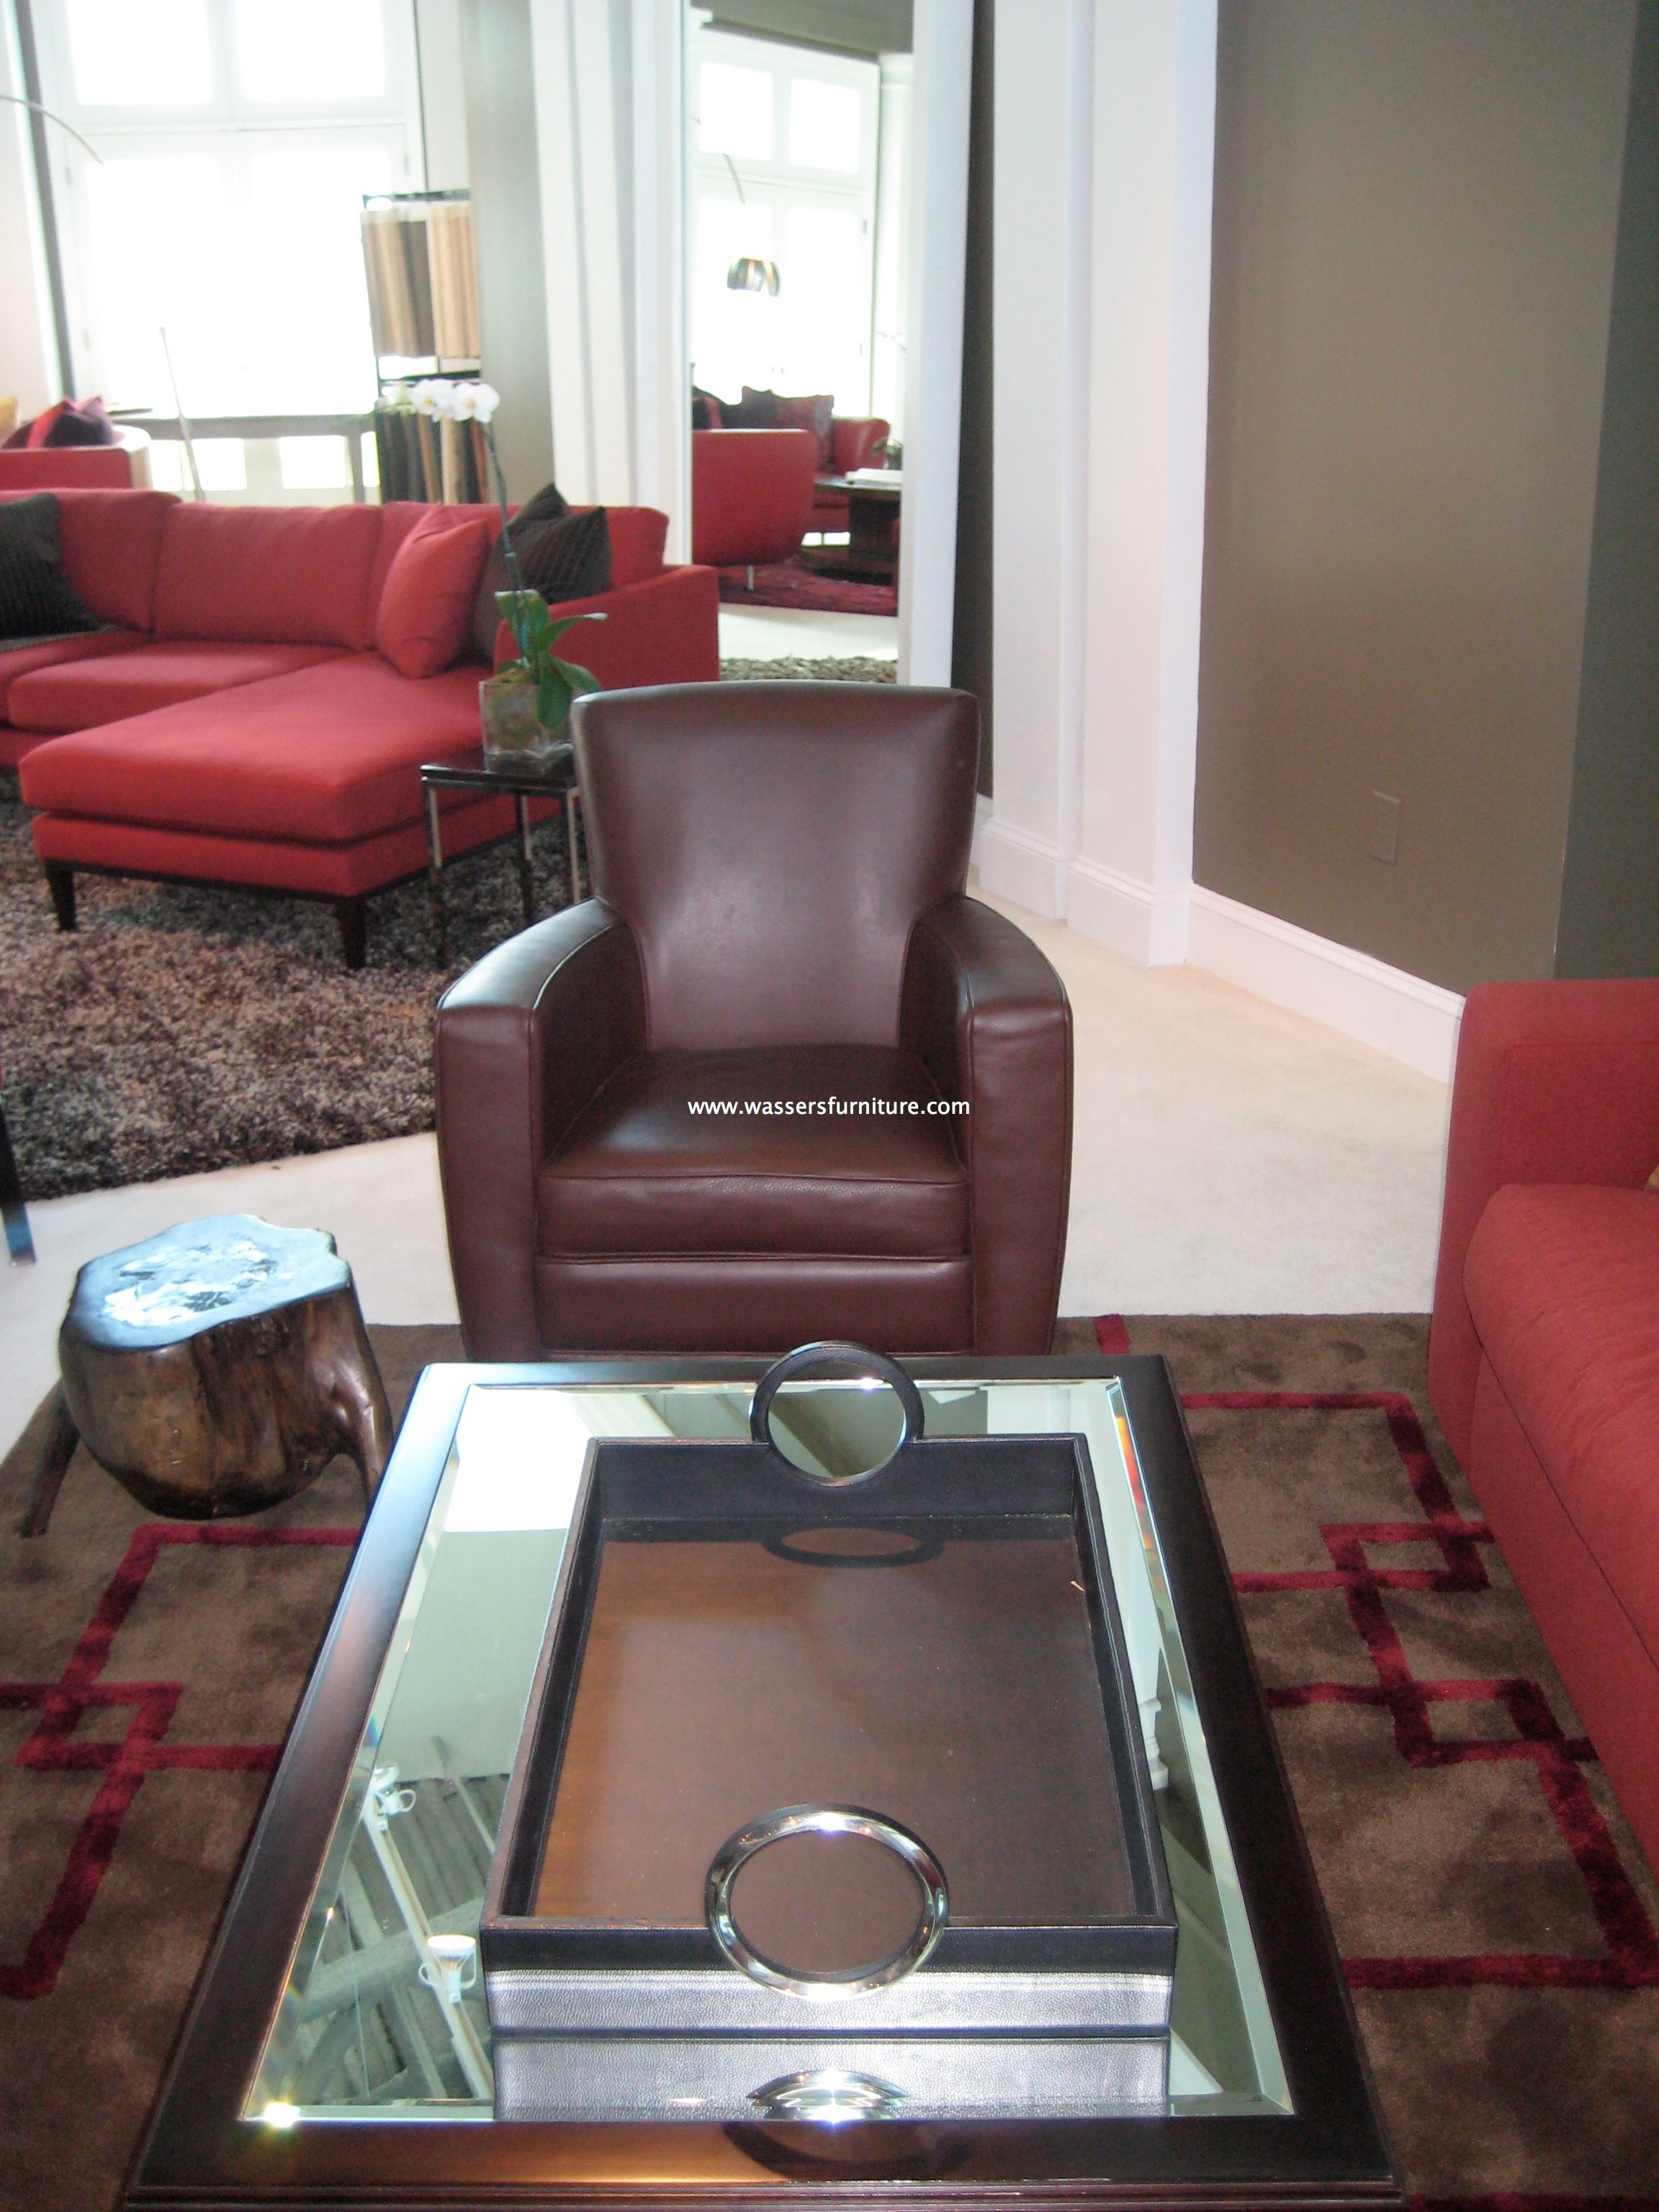 Wassers Furniture. Modern Contemporary Furniture Showroom And Interior  Design Studio, Hallandale Beach/Aventura